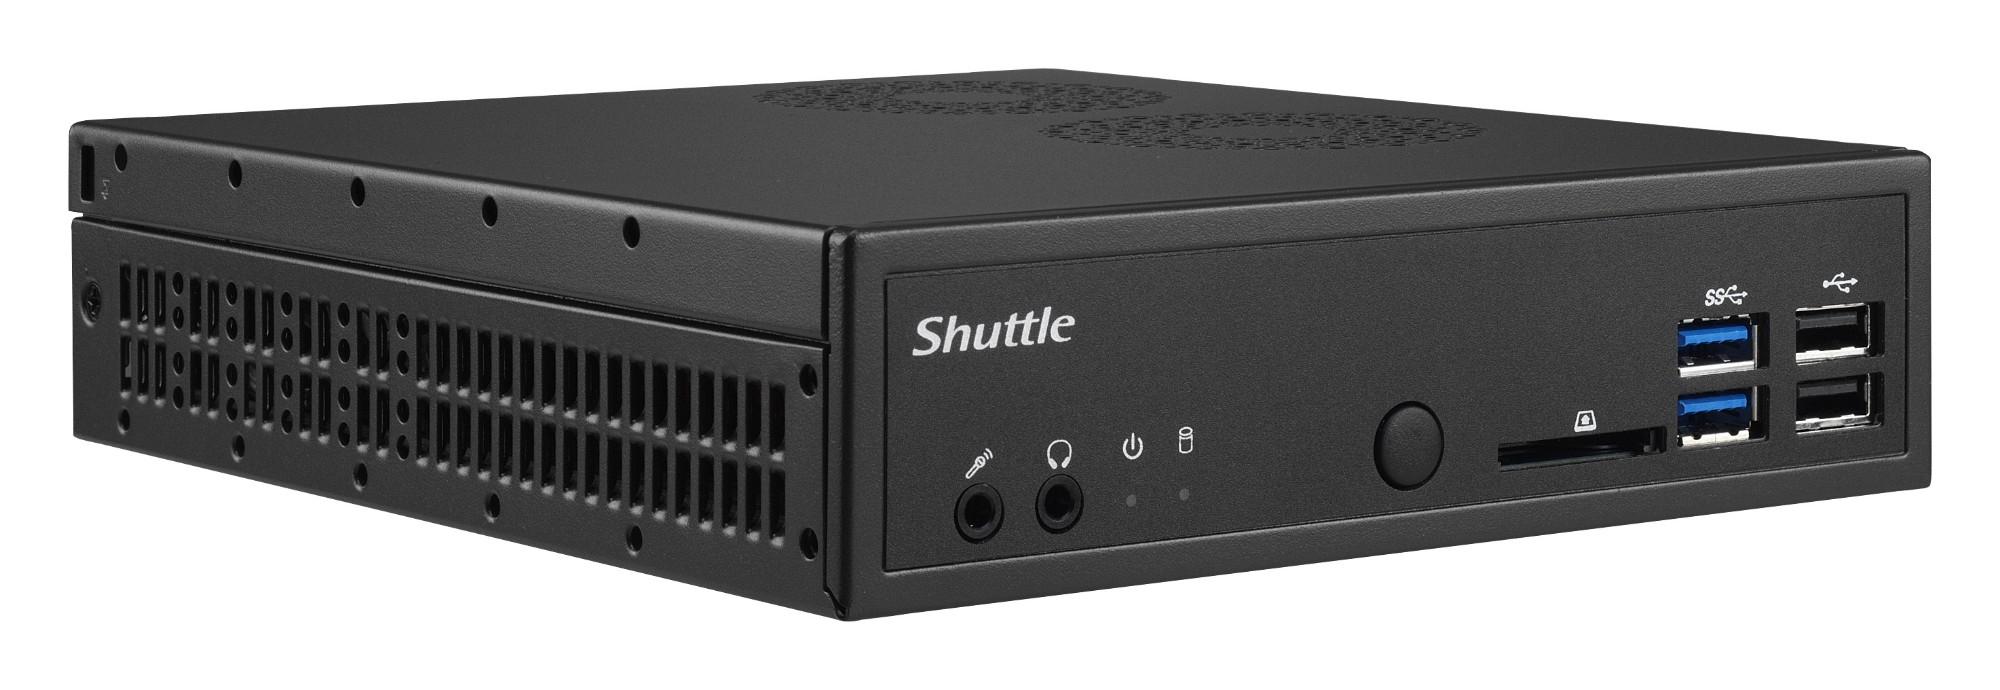 Shuttle DH170 Intel H170 LGA 1151 (Socket H4) 1.3L sized PC Black PC/workstation barebone